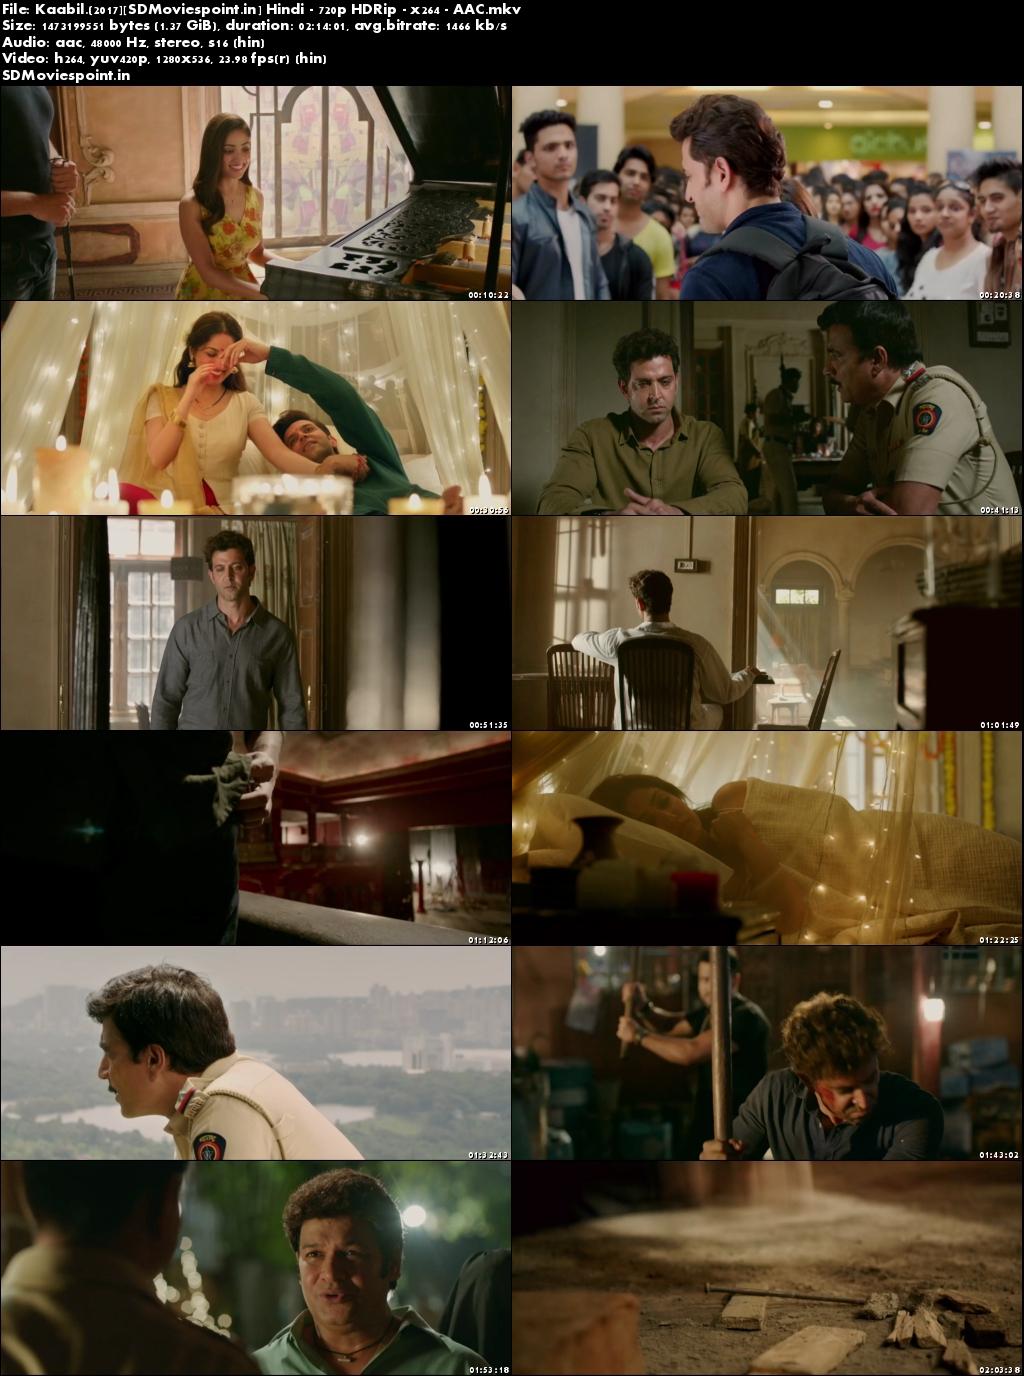 Screen Shots Kaabil (2017) Full HD Hindi Movie Download 720p